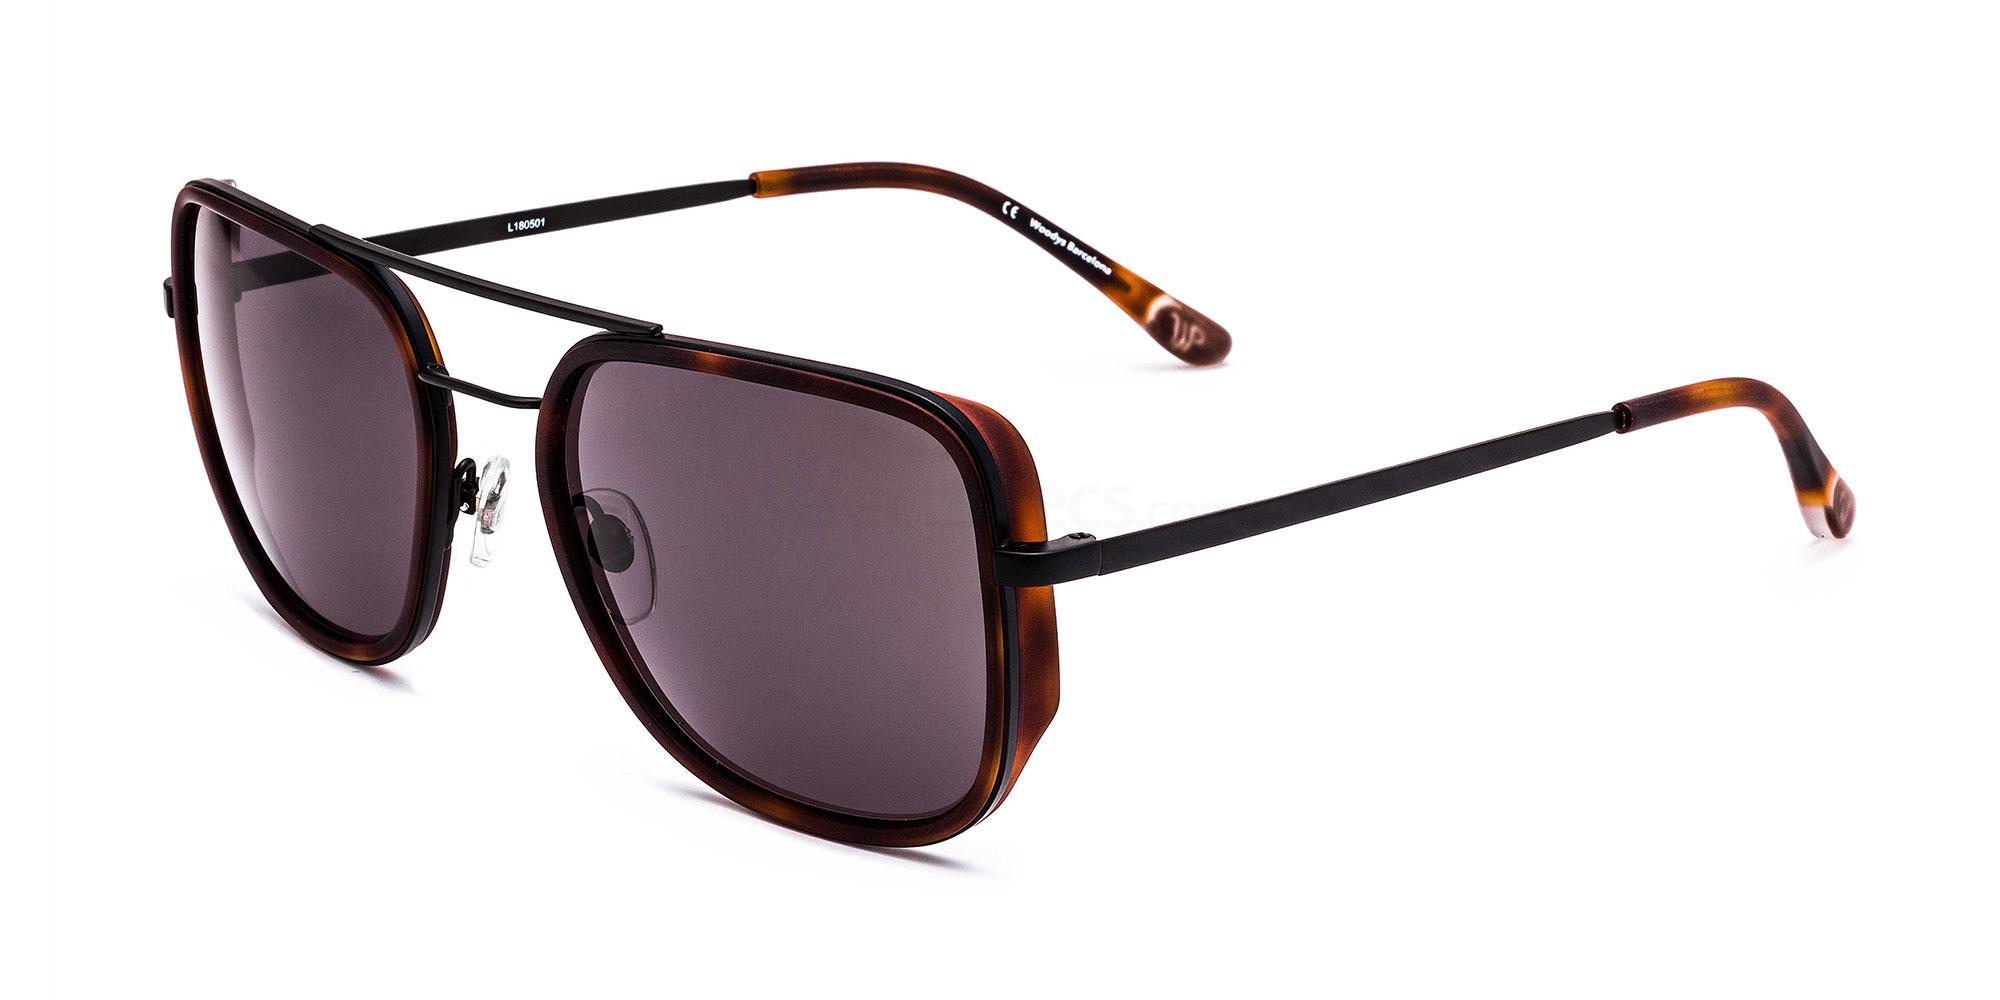 01 Charly Sunglasses, Woody`s Barcelona